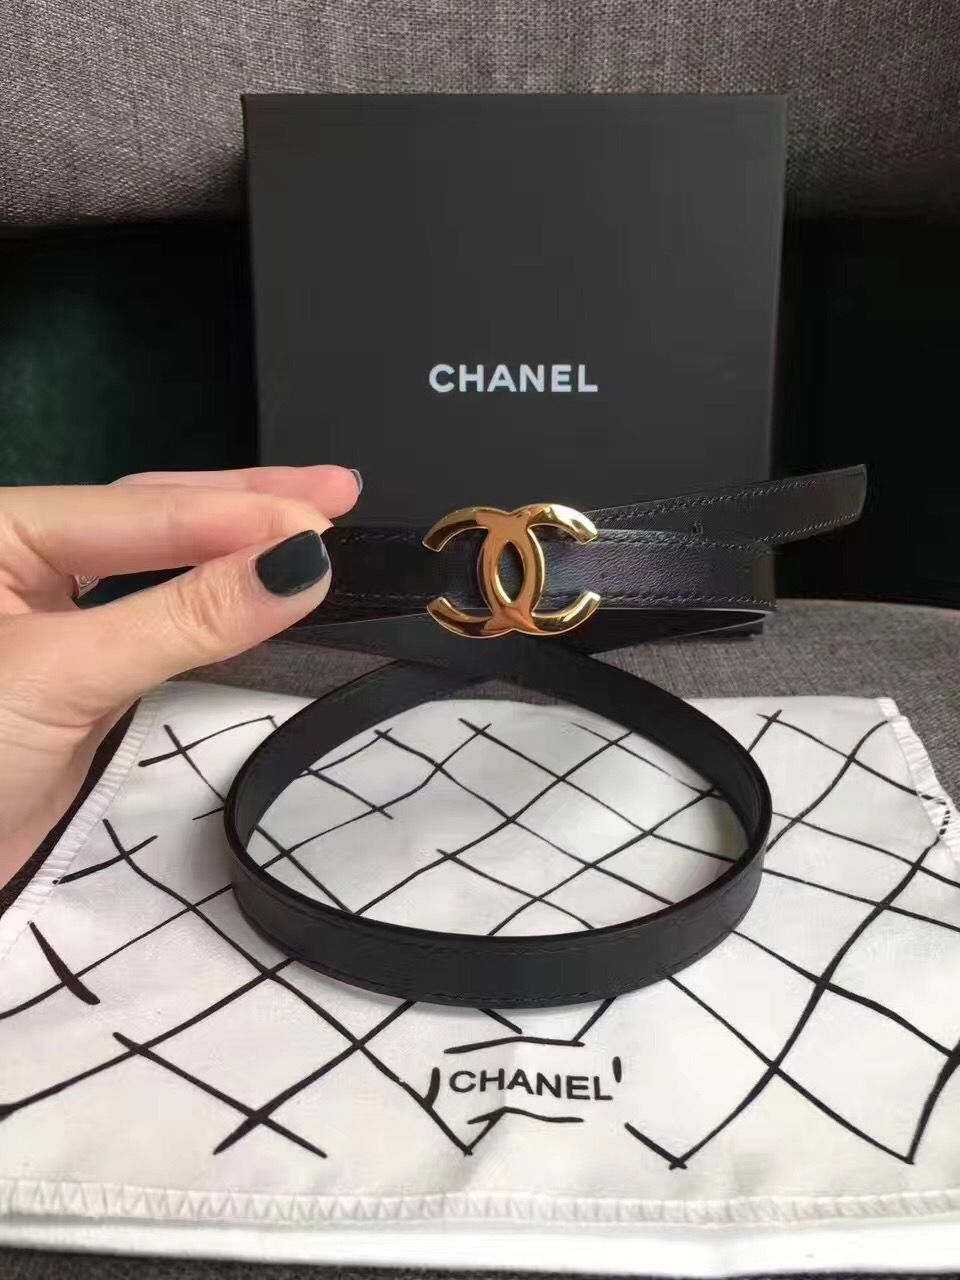 6a4d4cb7c9669 Chanel woman belt Fashion Belts